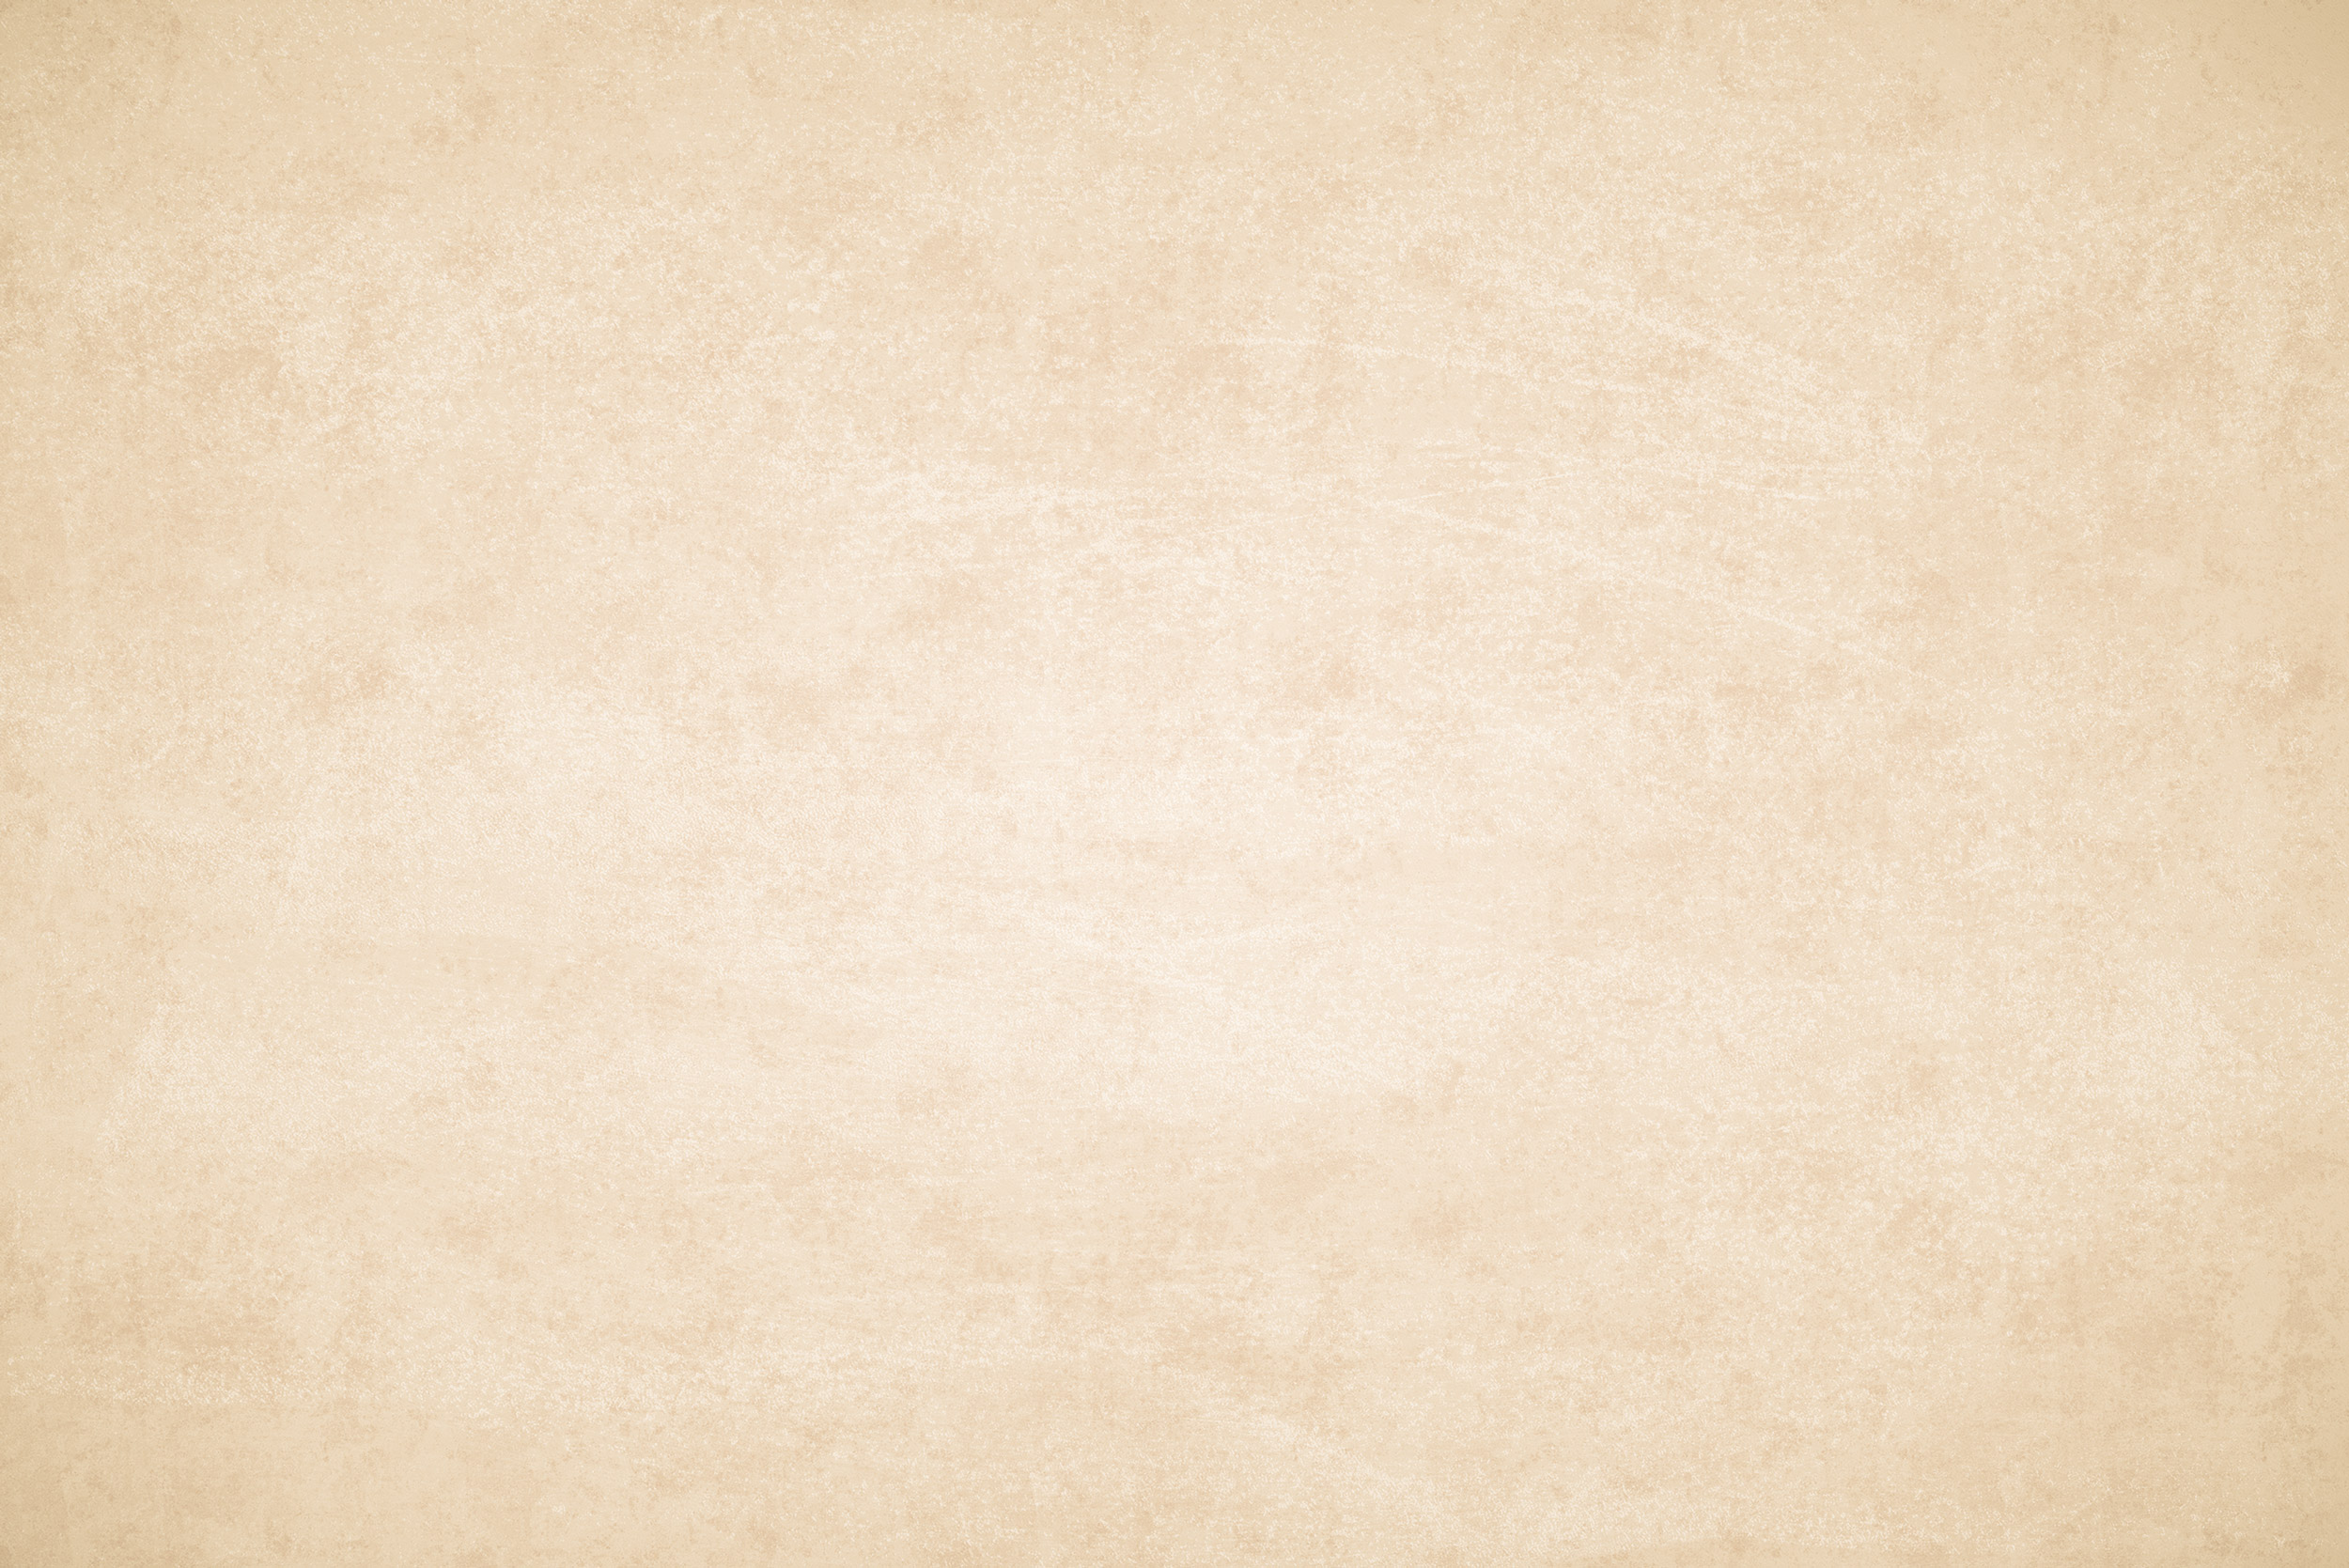 Картинка бумажные обои текстура бежевого цвета